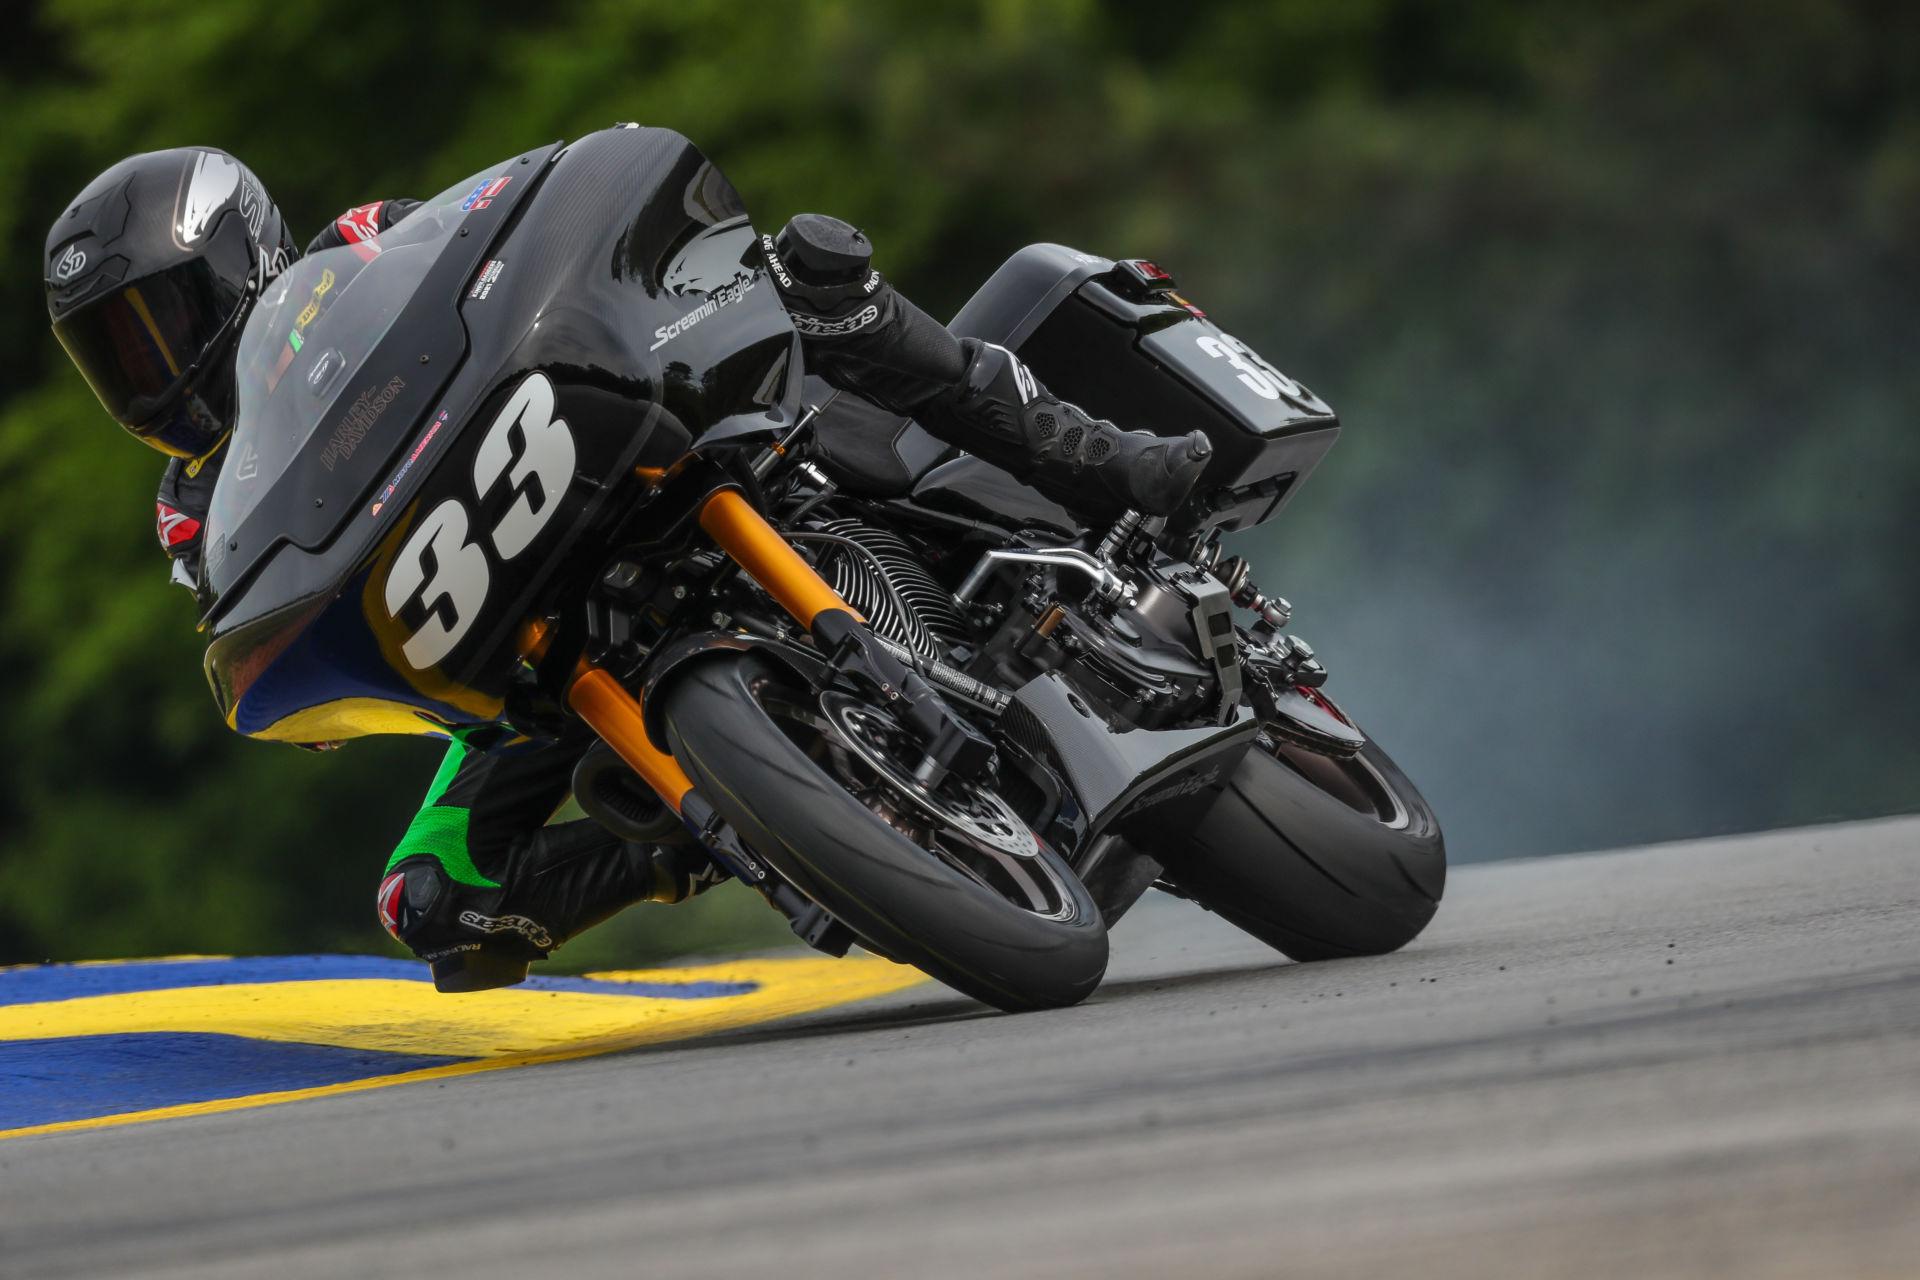 Kyle Wyman (33) on his Screamin' Eagle Harley-Davidson Road Glide, as seen at Road Atlanta. Photo by Brian J. Nelson.